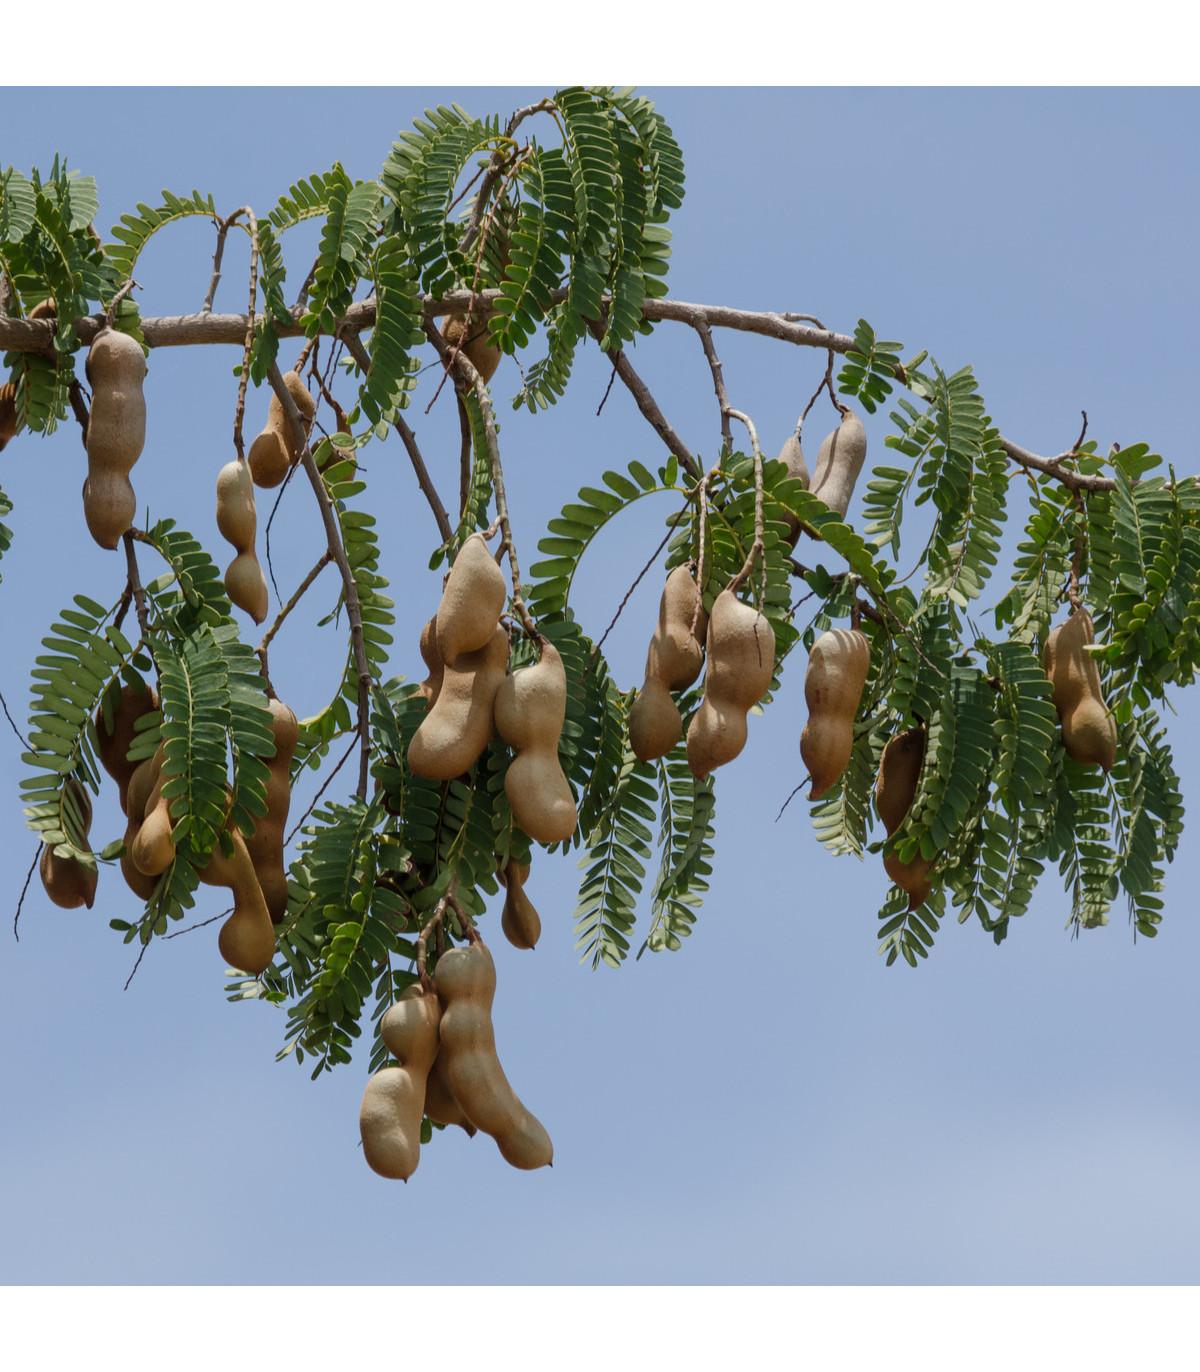 Tamarind indický - Tamarindus indica - osivo tamarindu - 5 ks